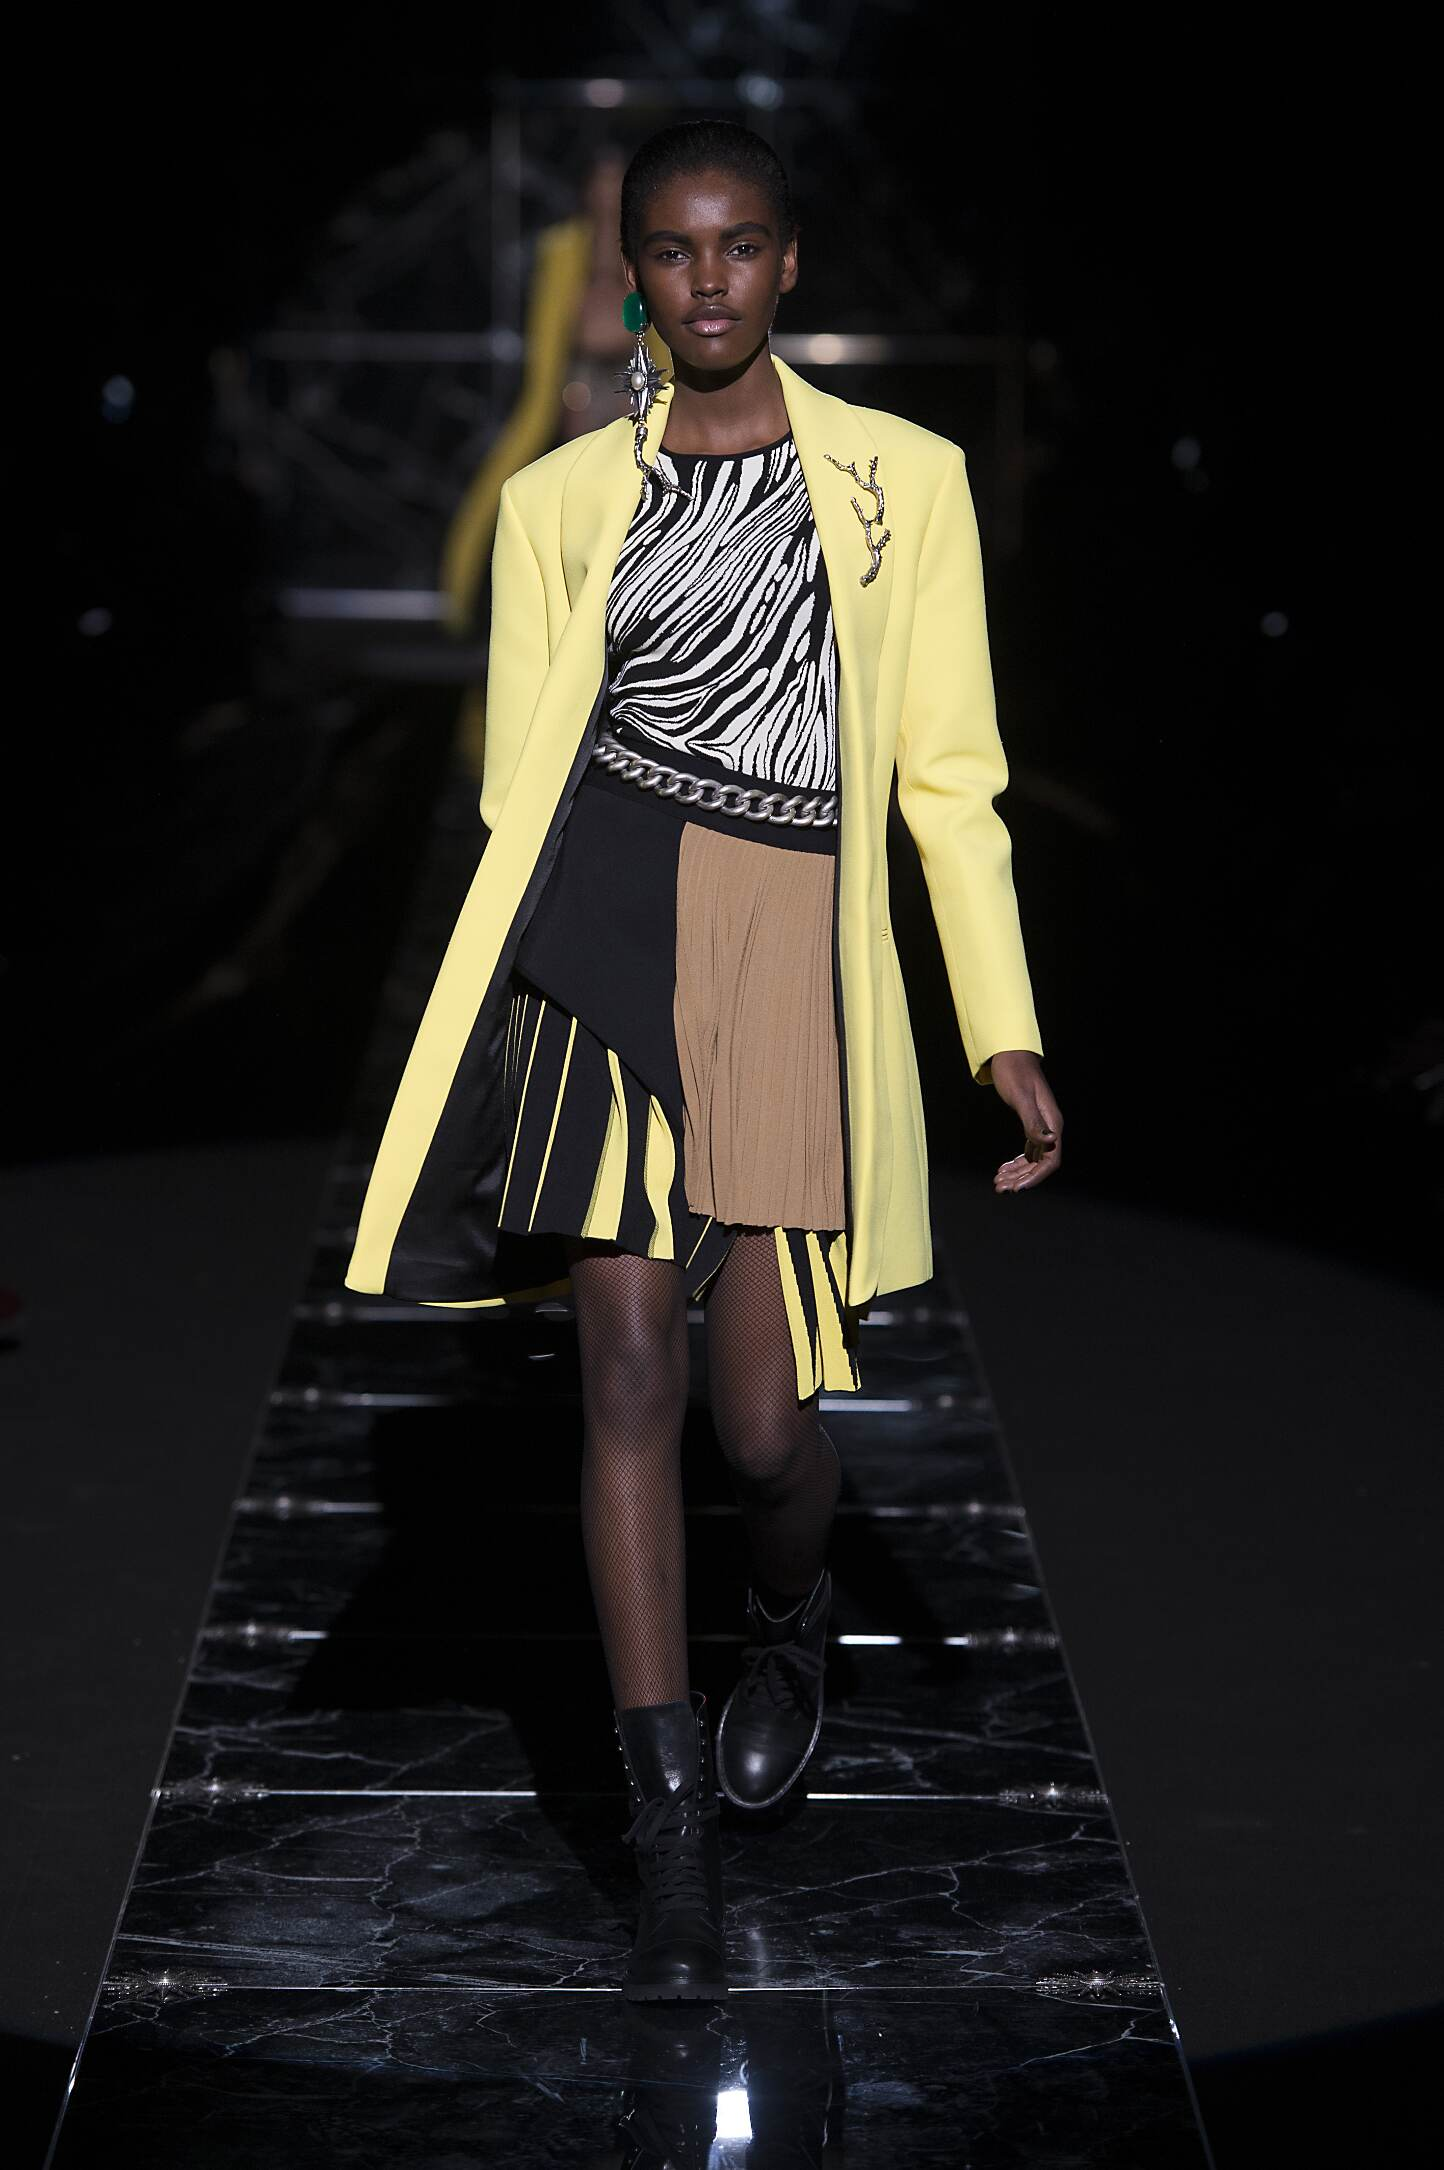 2015 Fashion Woman Model Fausto Puglisi Collection Catwalk